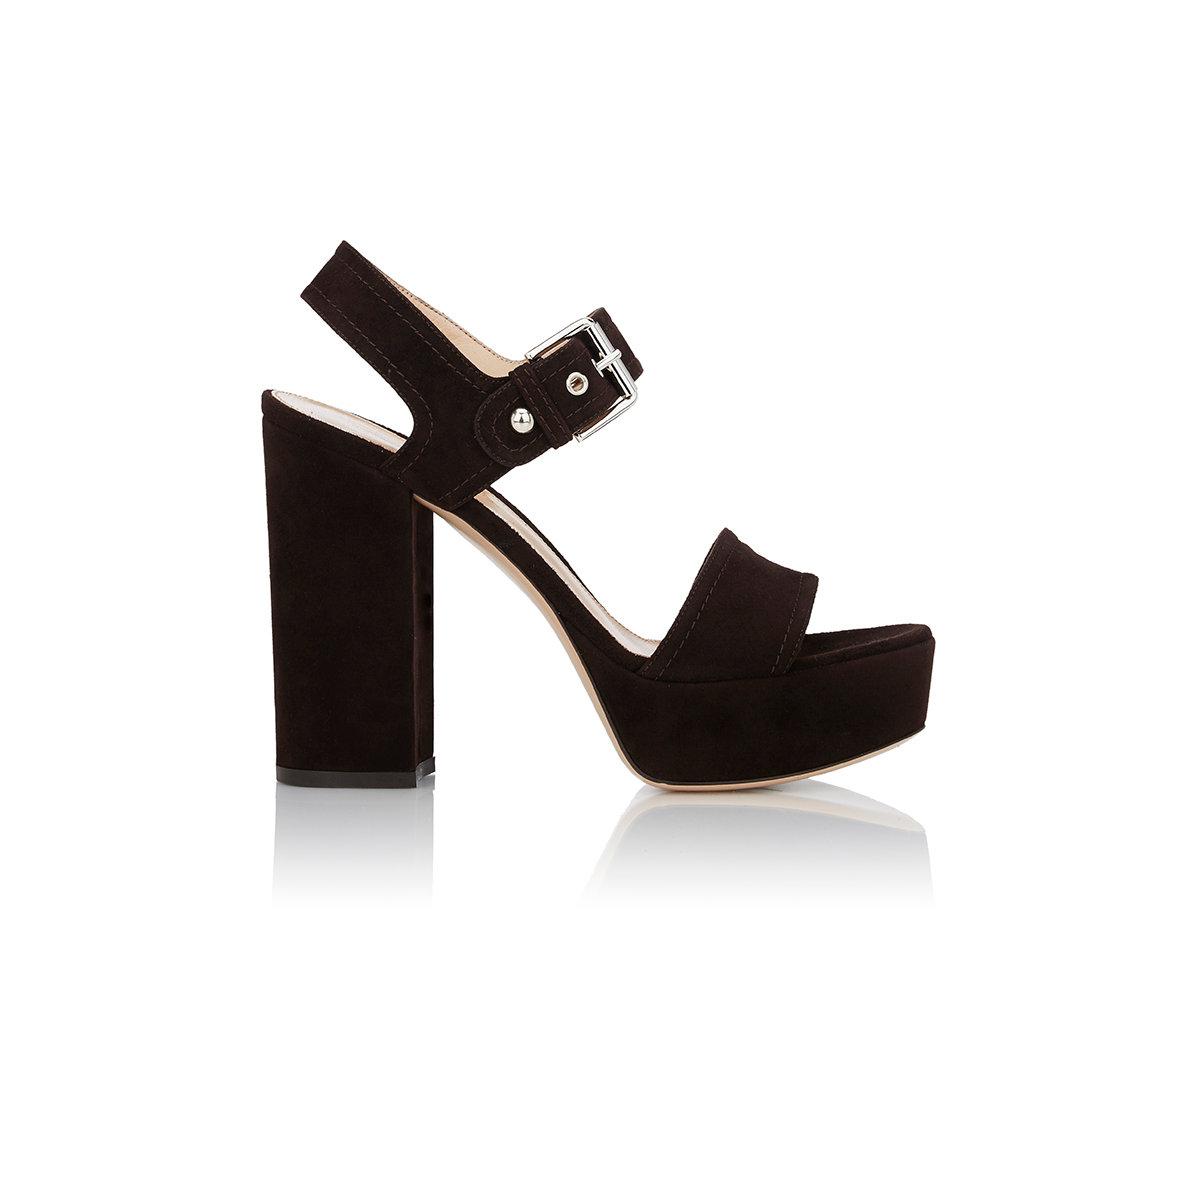 87e8cbb9335bc Lyst - Gianvito Rossi Gina Platform Sandals in Black